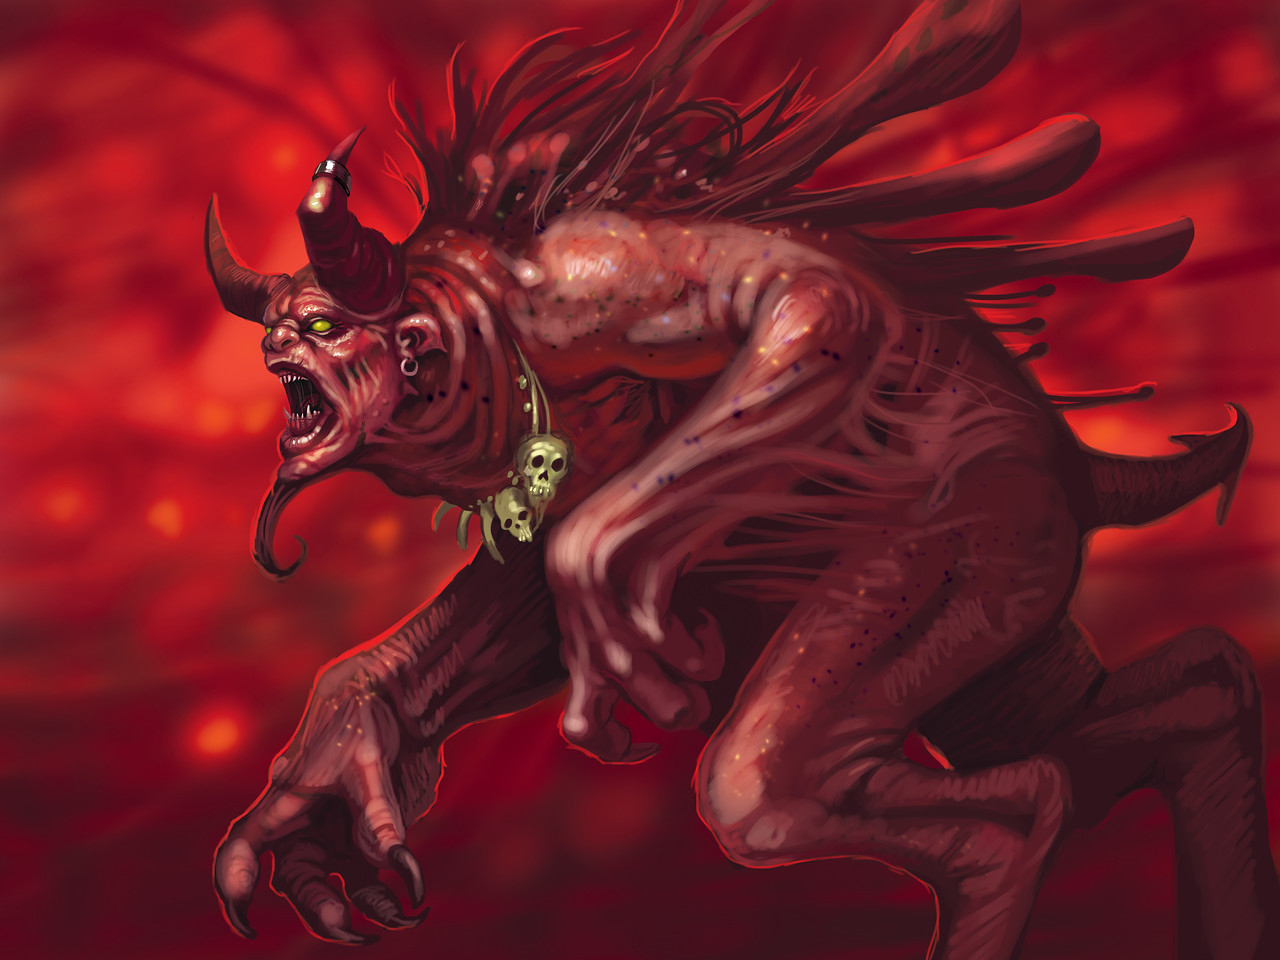 Hater demon